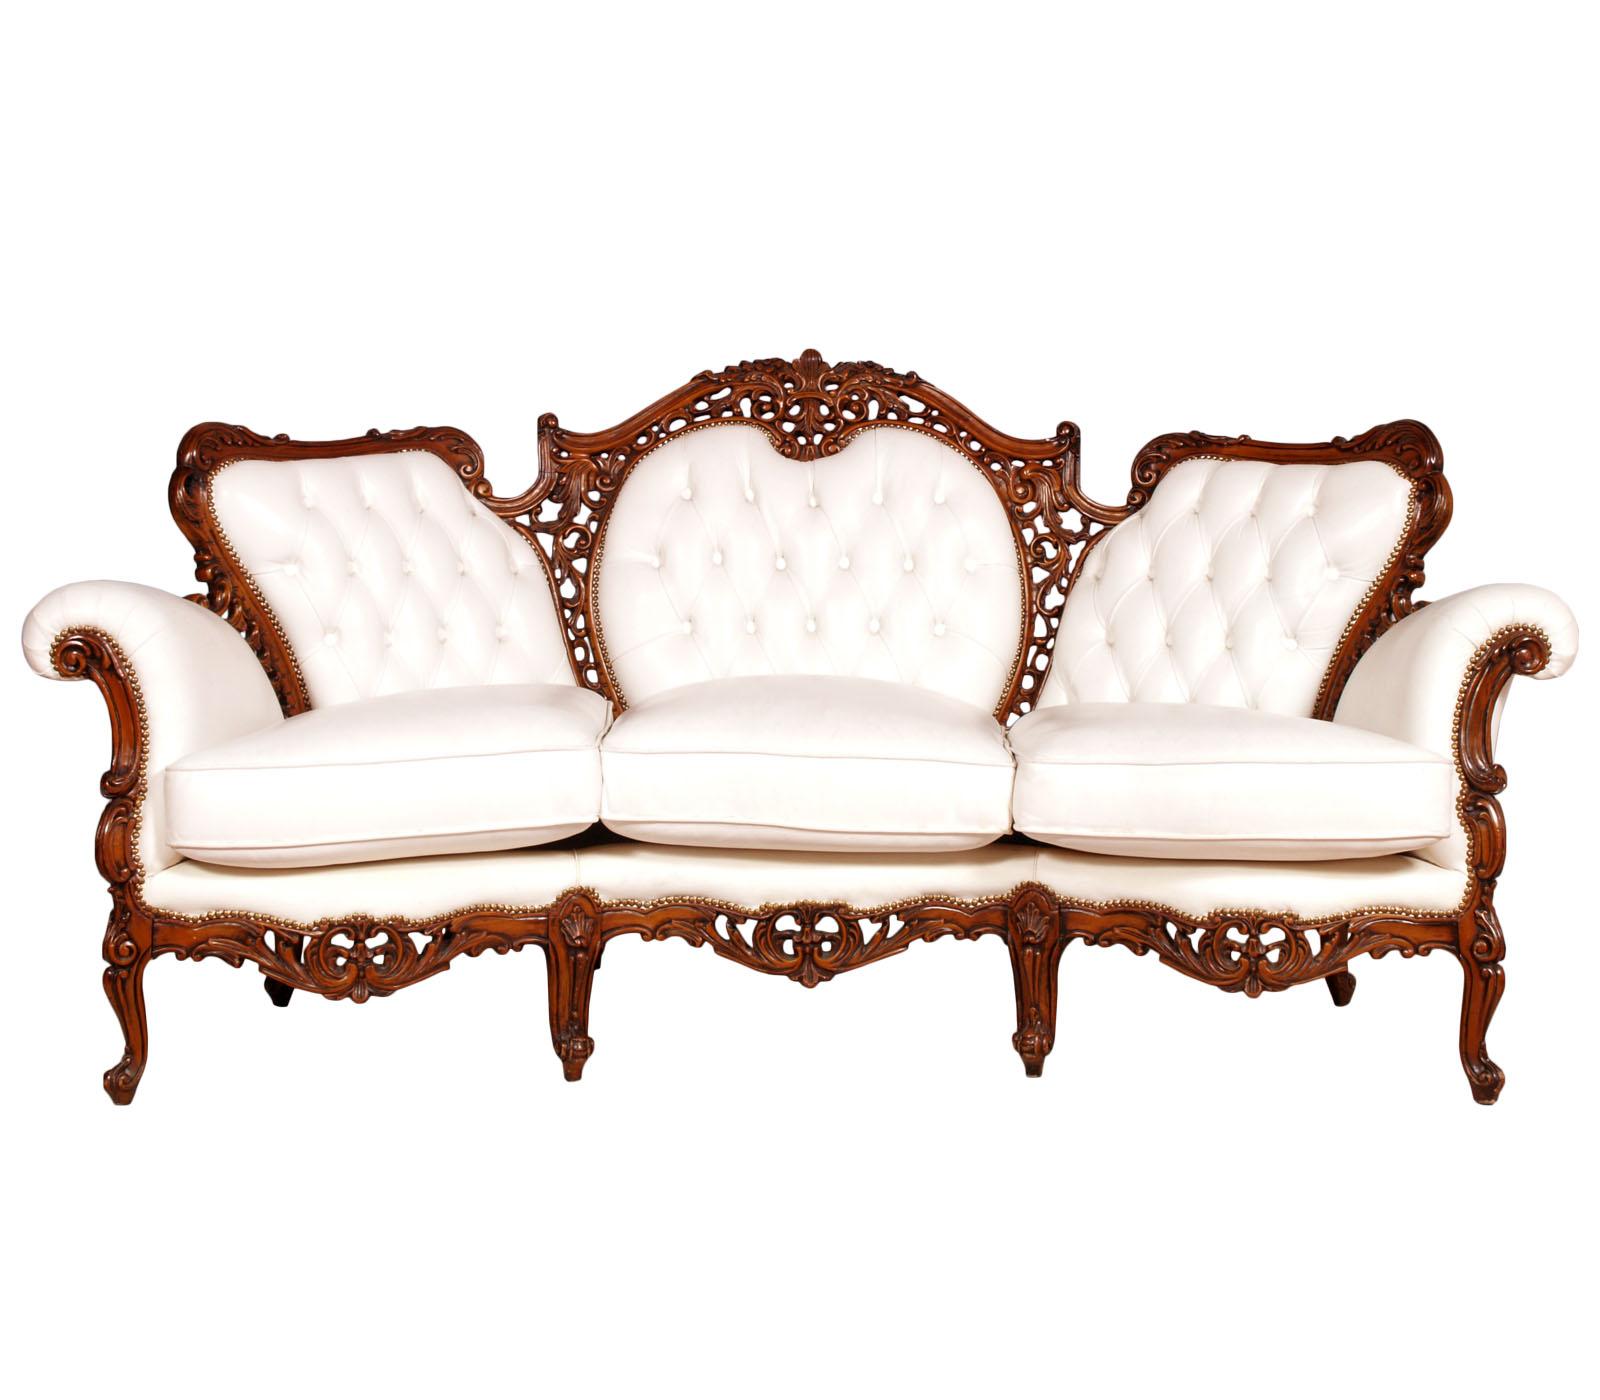 Antique baroque sofa with armchairs divano barocco con for Divano barocco